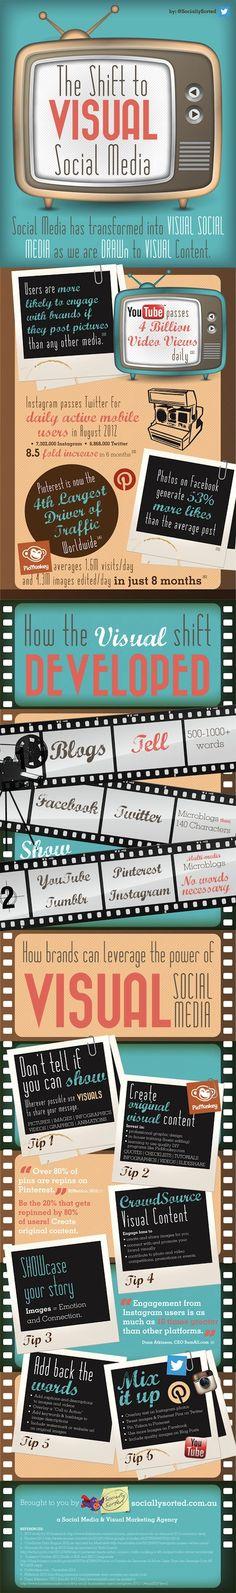 The shift to visual #SocialMedia